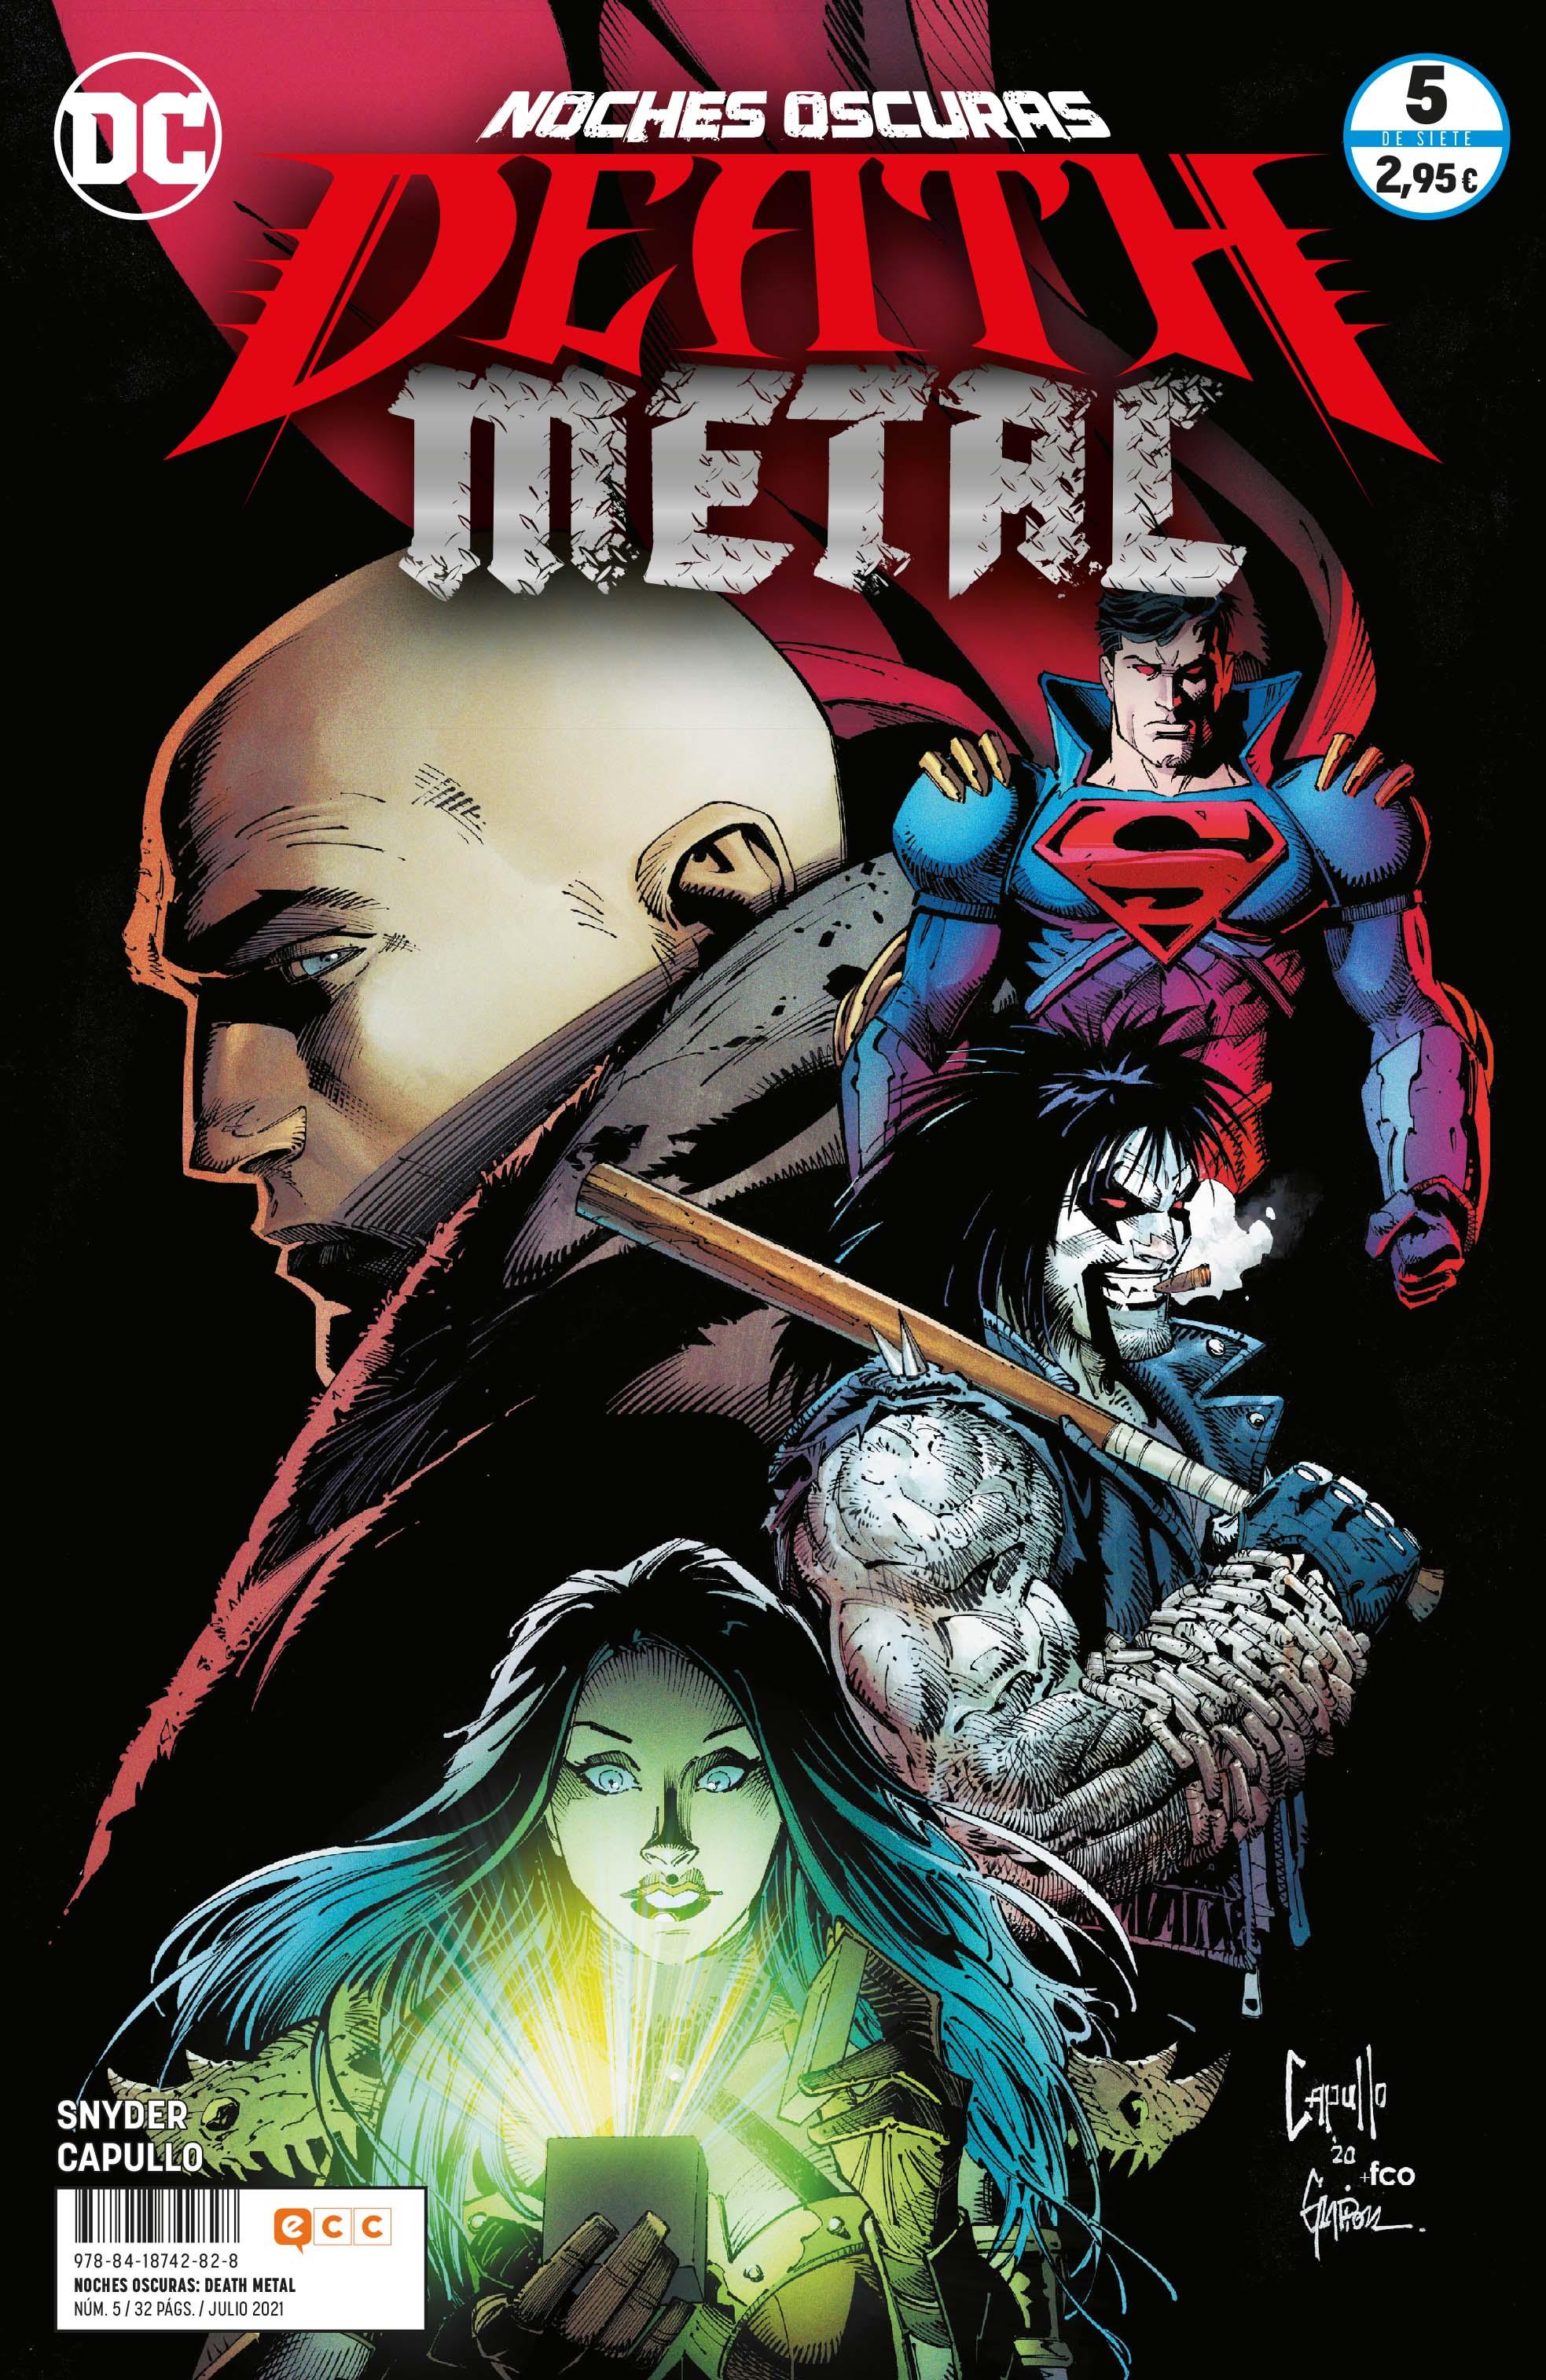 Noches oscuras: Death Metal núm. 05 de 7